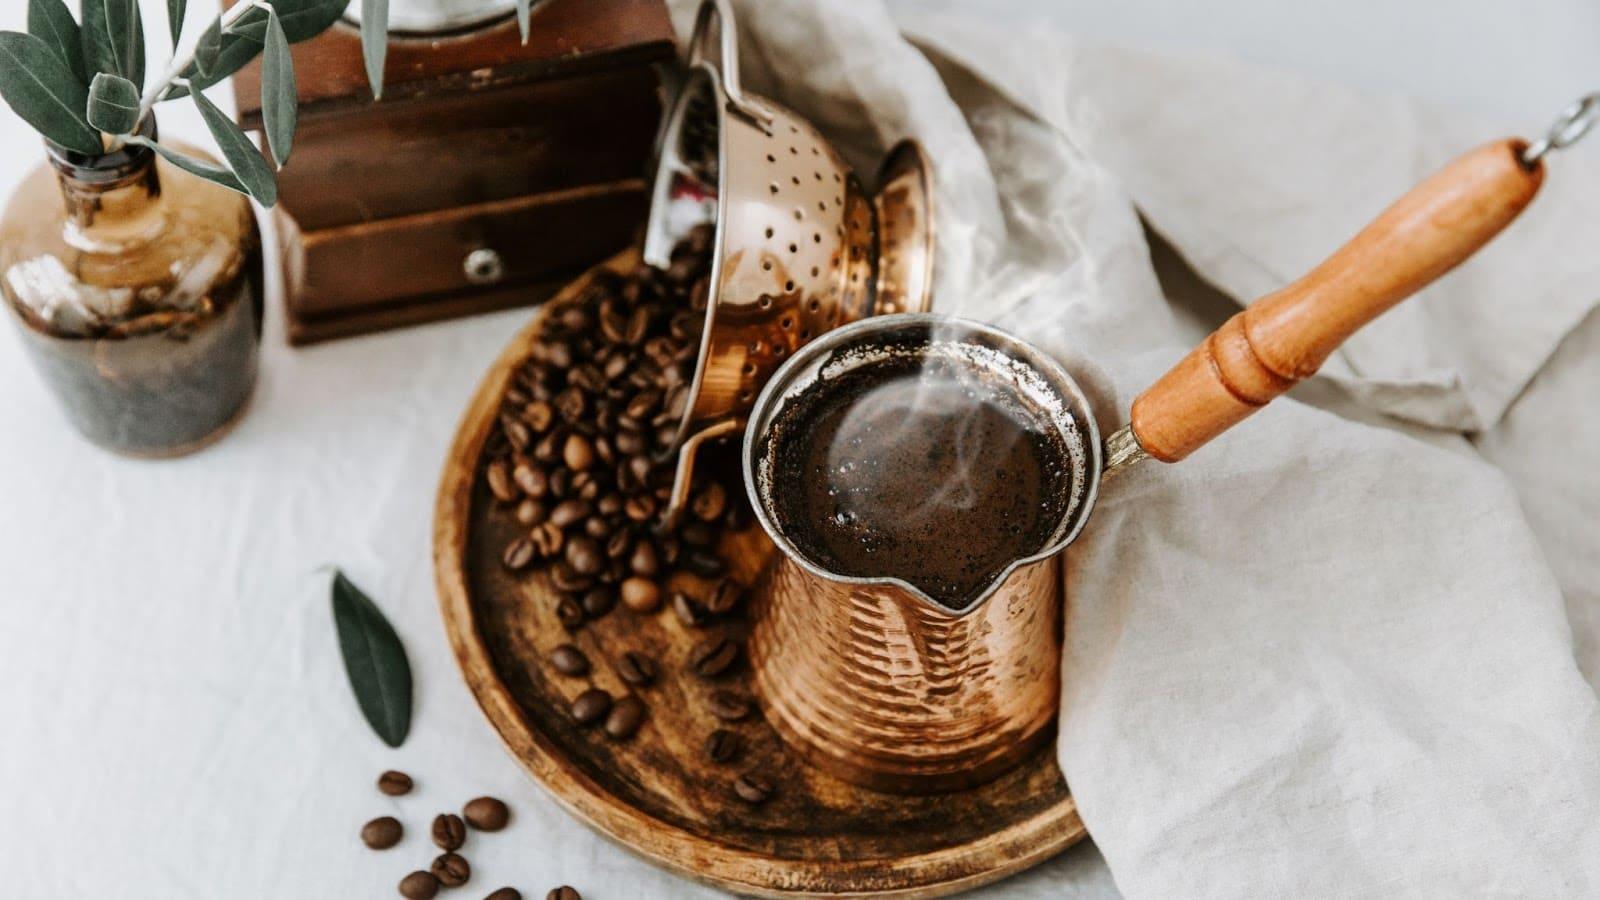 Highly caffeinated Türk Kahvesi from Turkey